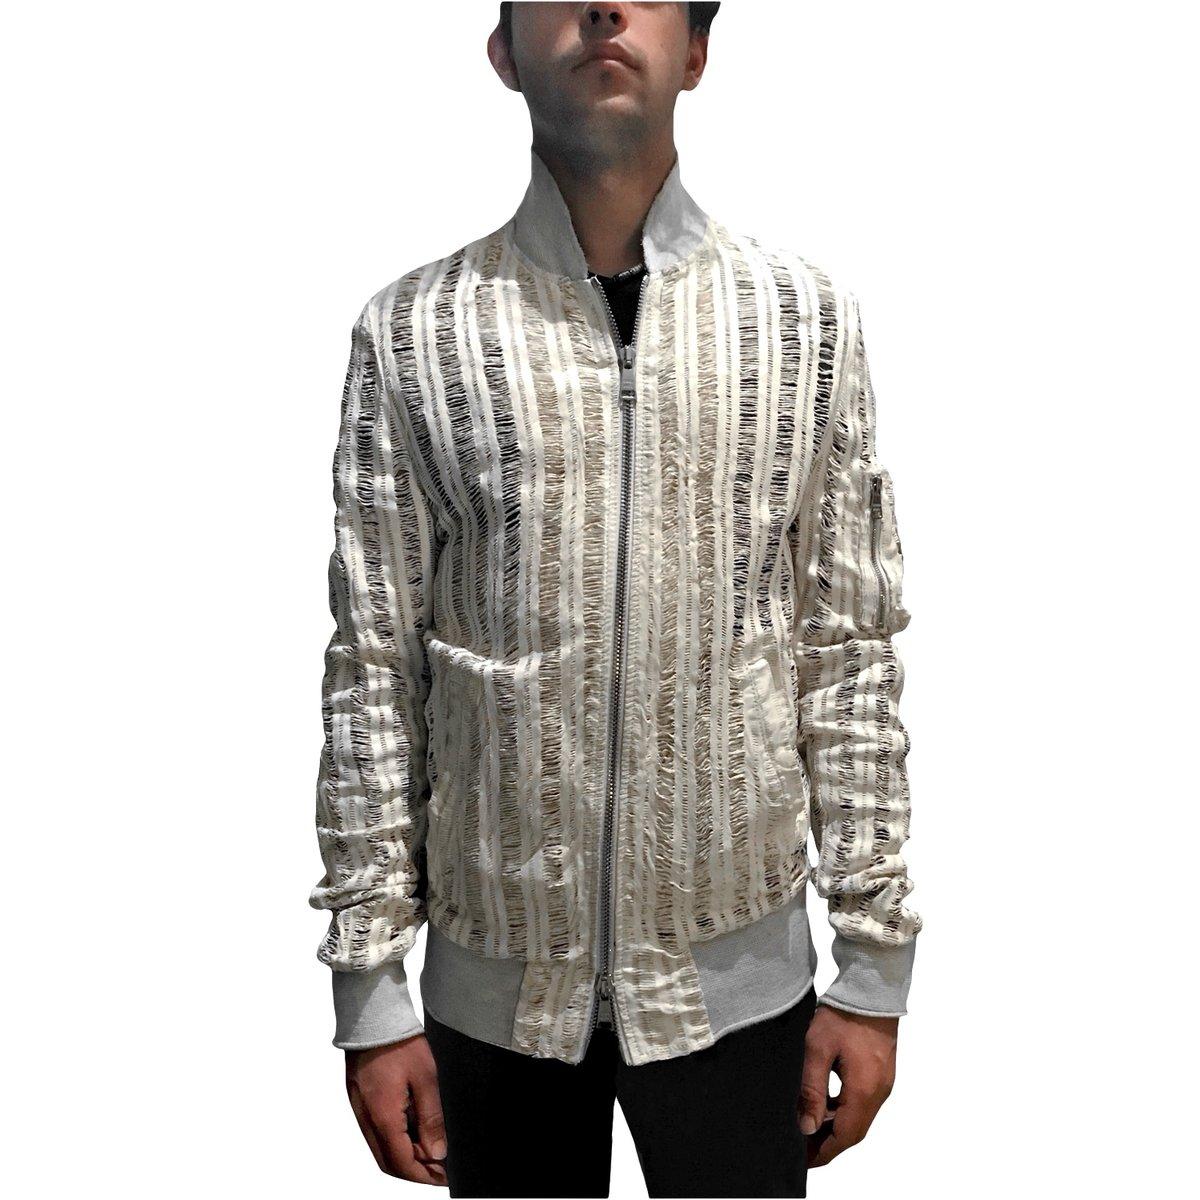 giorgio brato white perforated leather bomber jacket fit .jpg